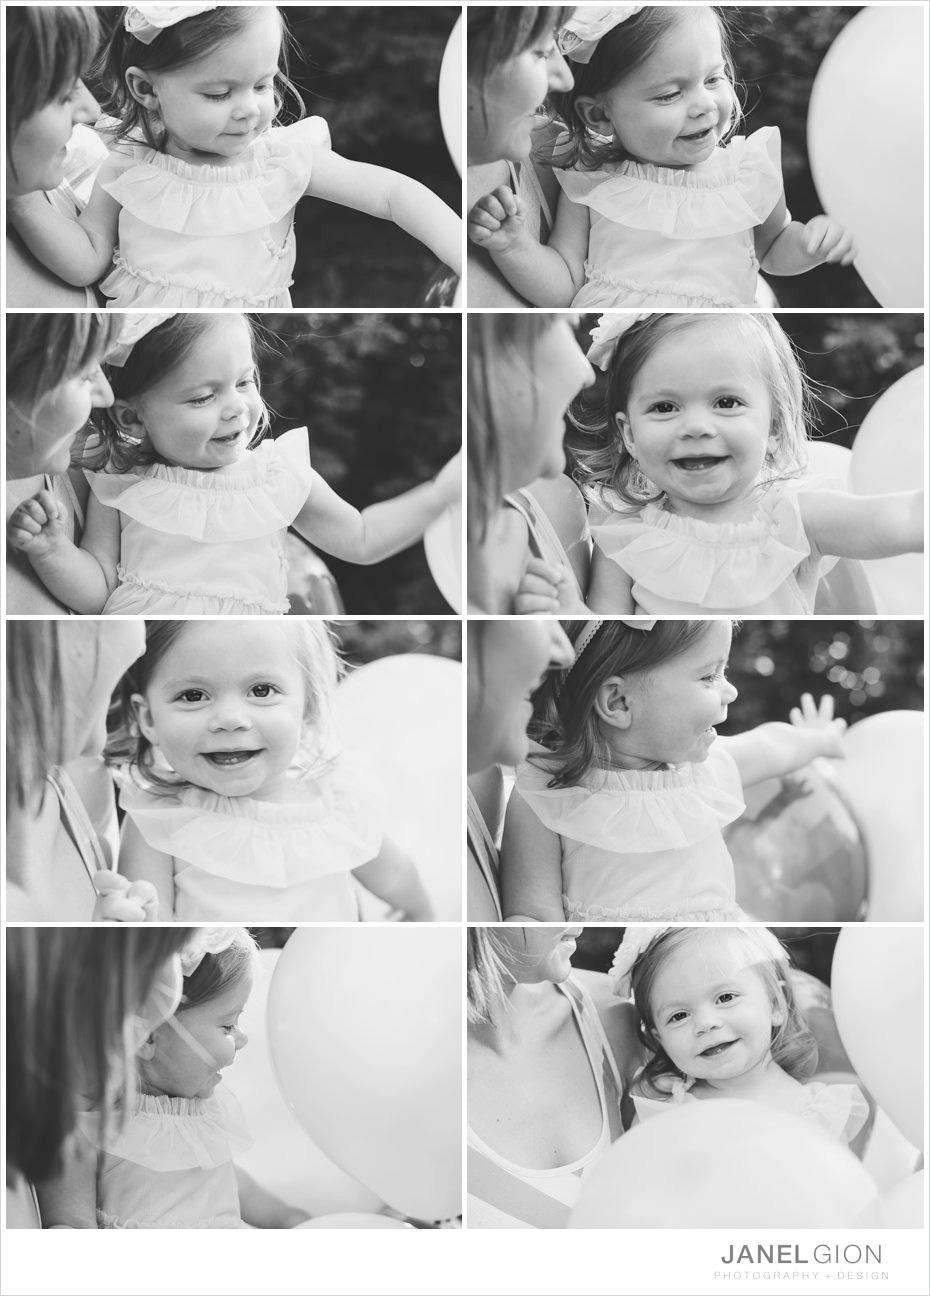 Janel-Gion-toddler-girl-balloon-photos_00221.jpg